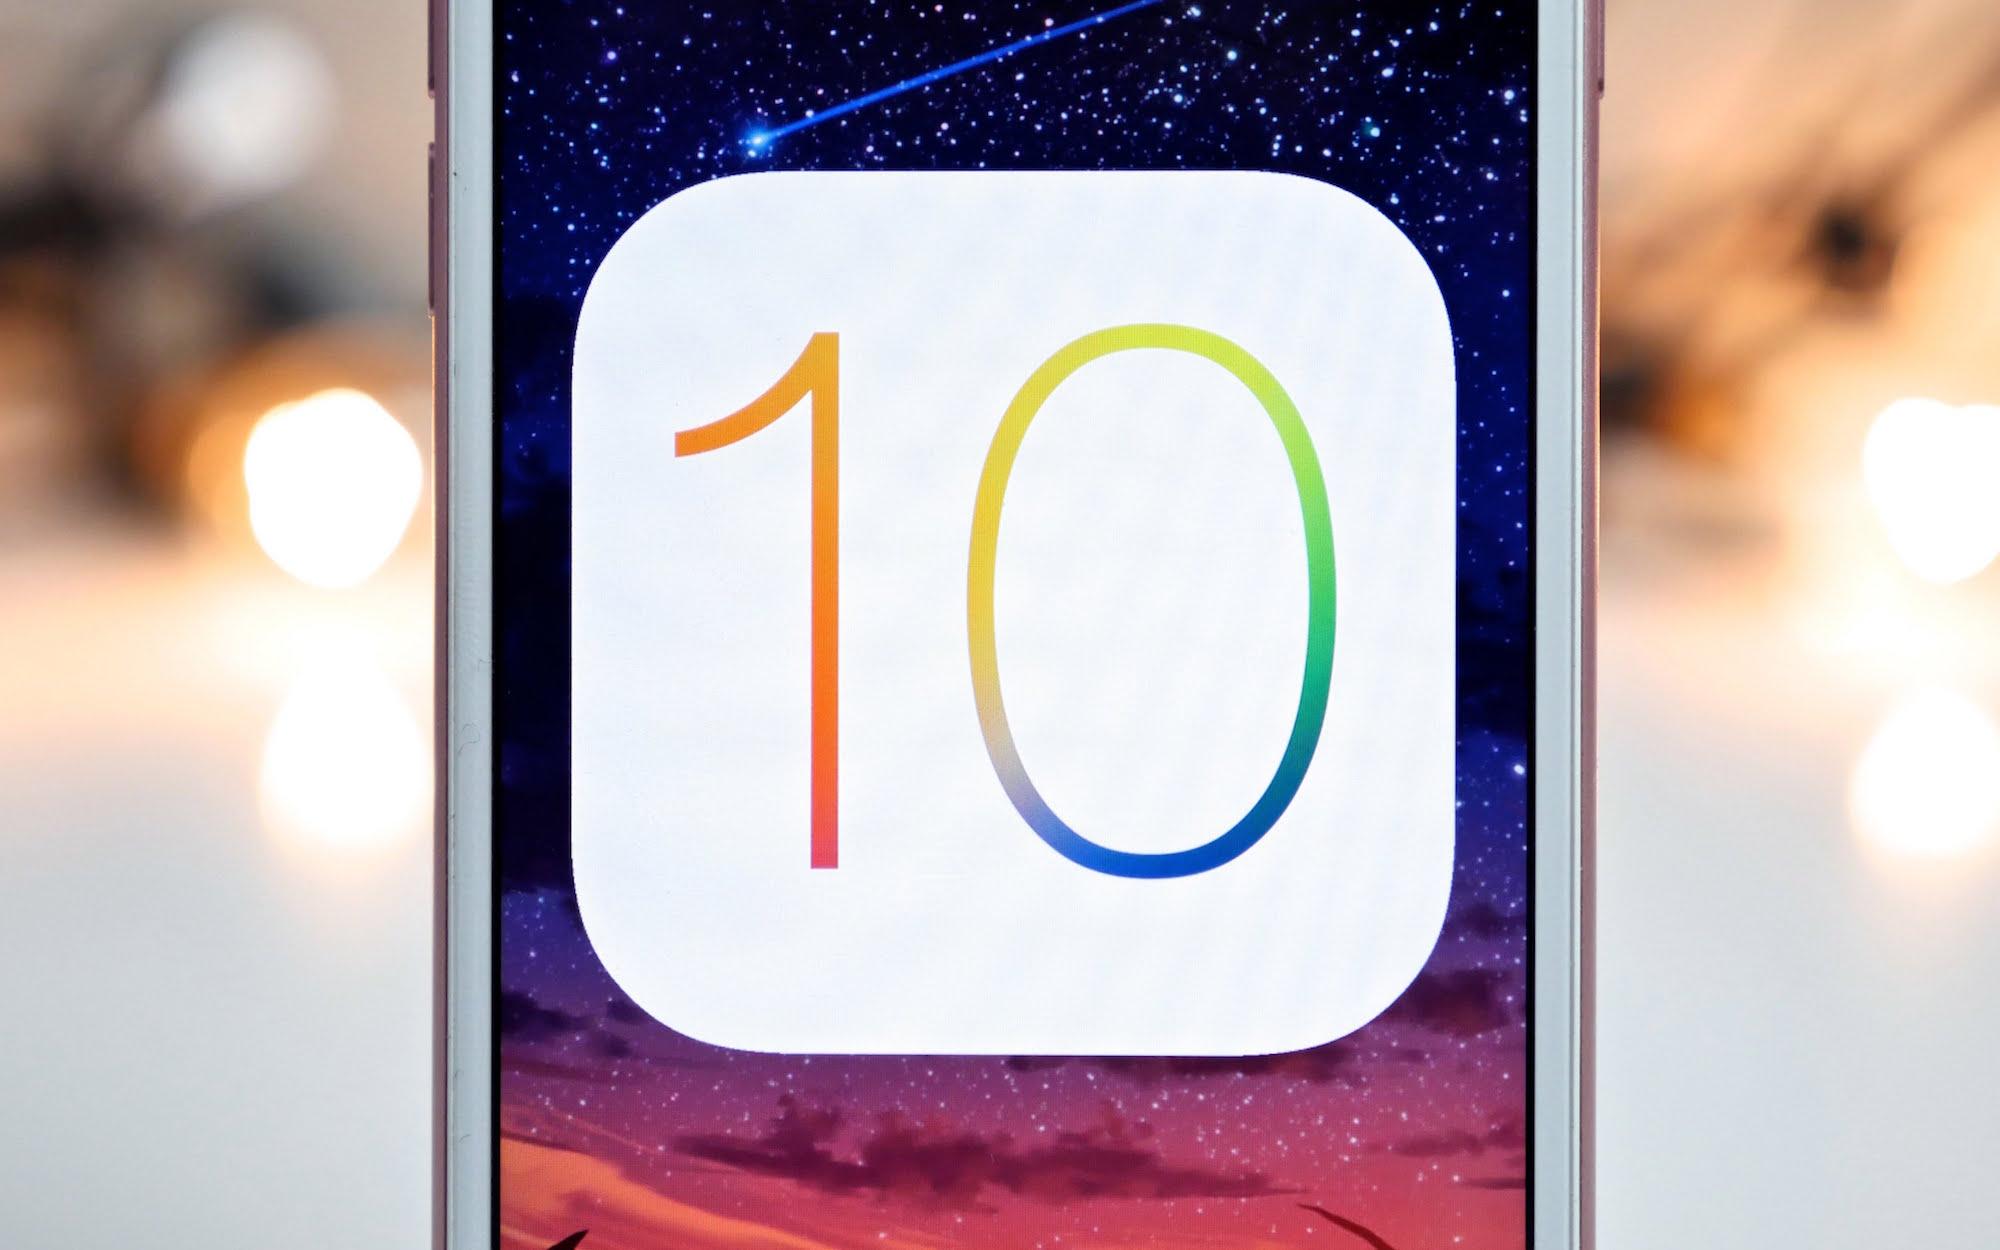 Можно ли обновить iPhone 5S до iOS 10